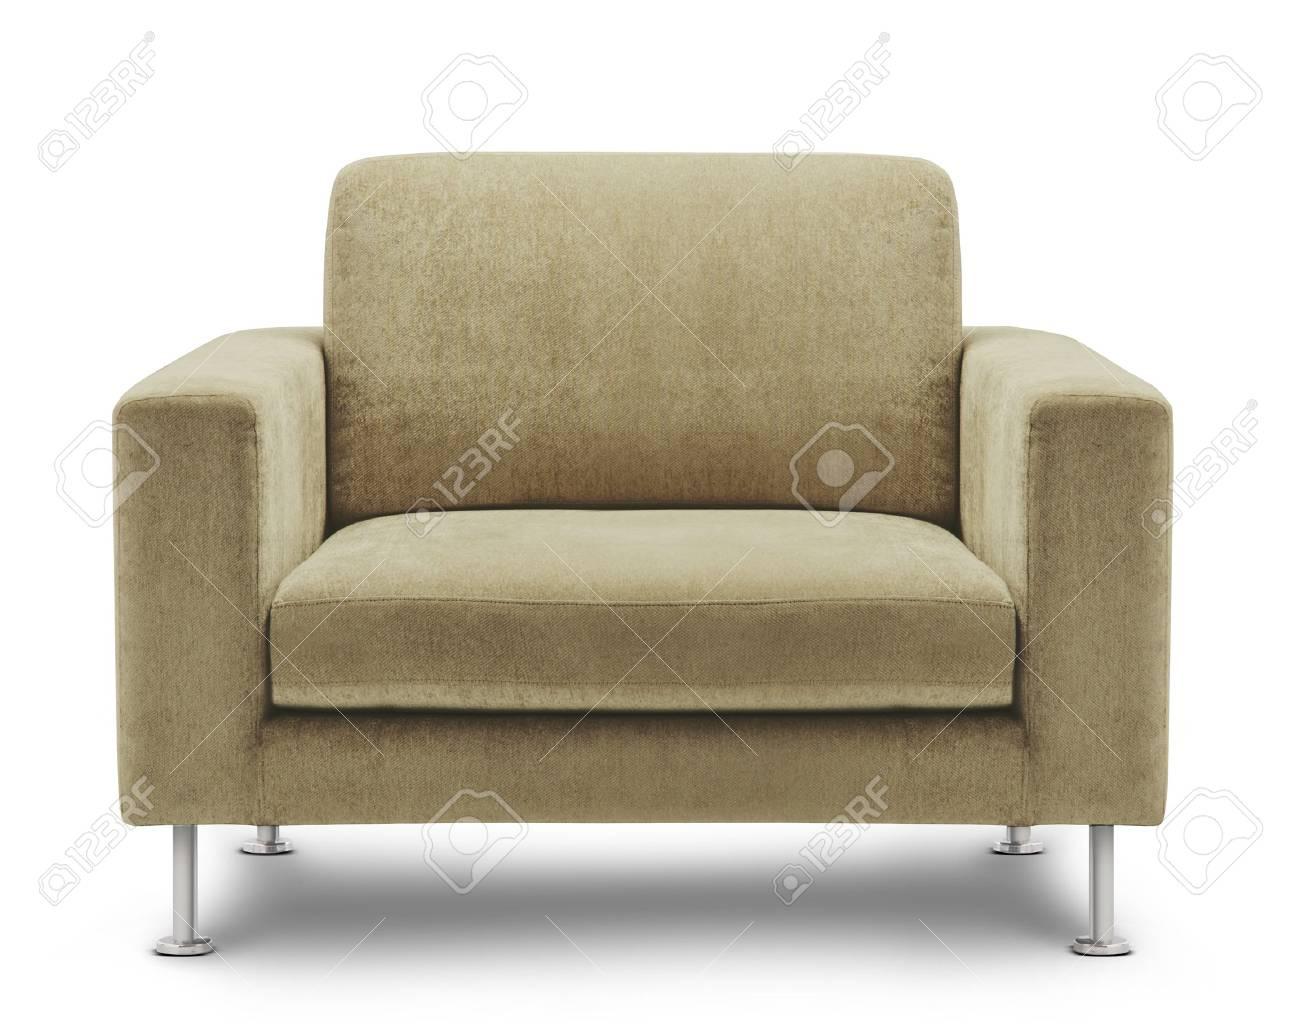 sofa furniture isolated on white background Stock Photo - 12319894